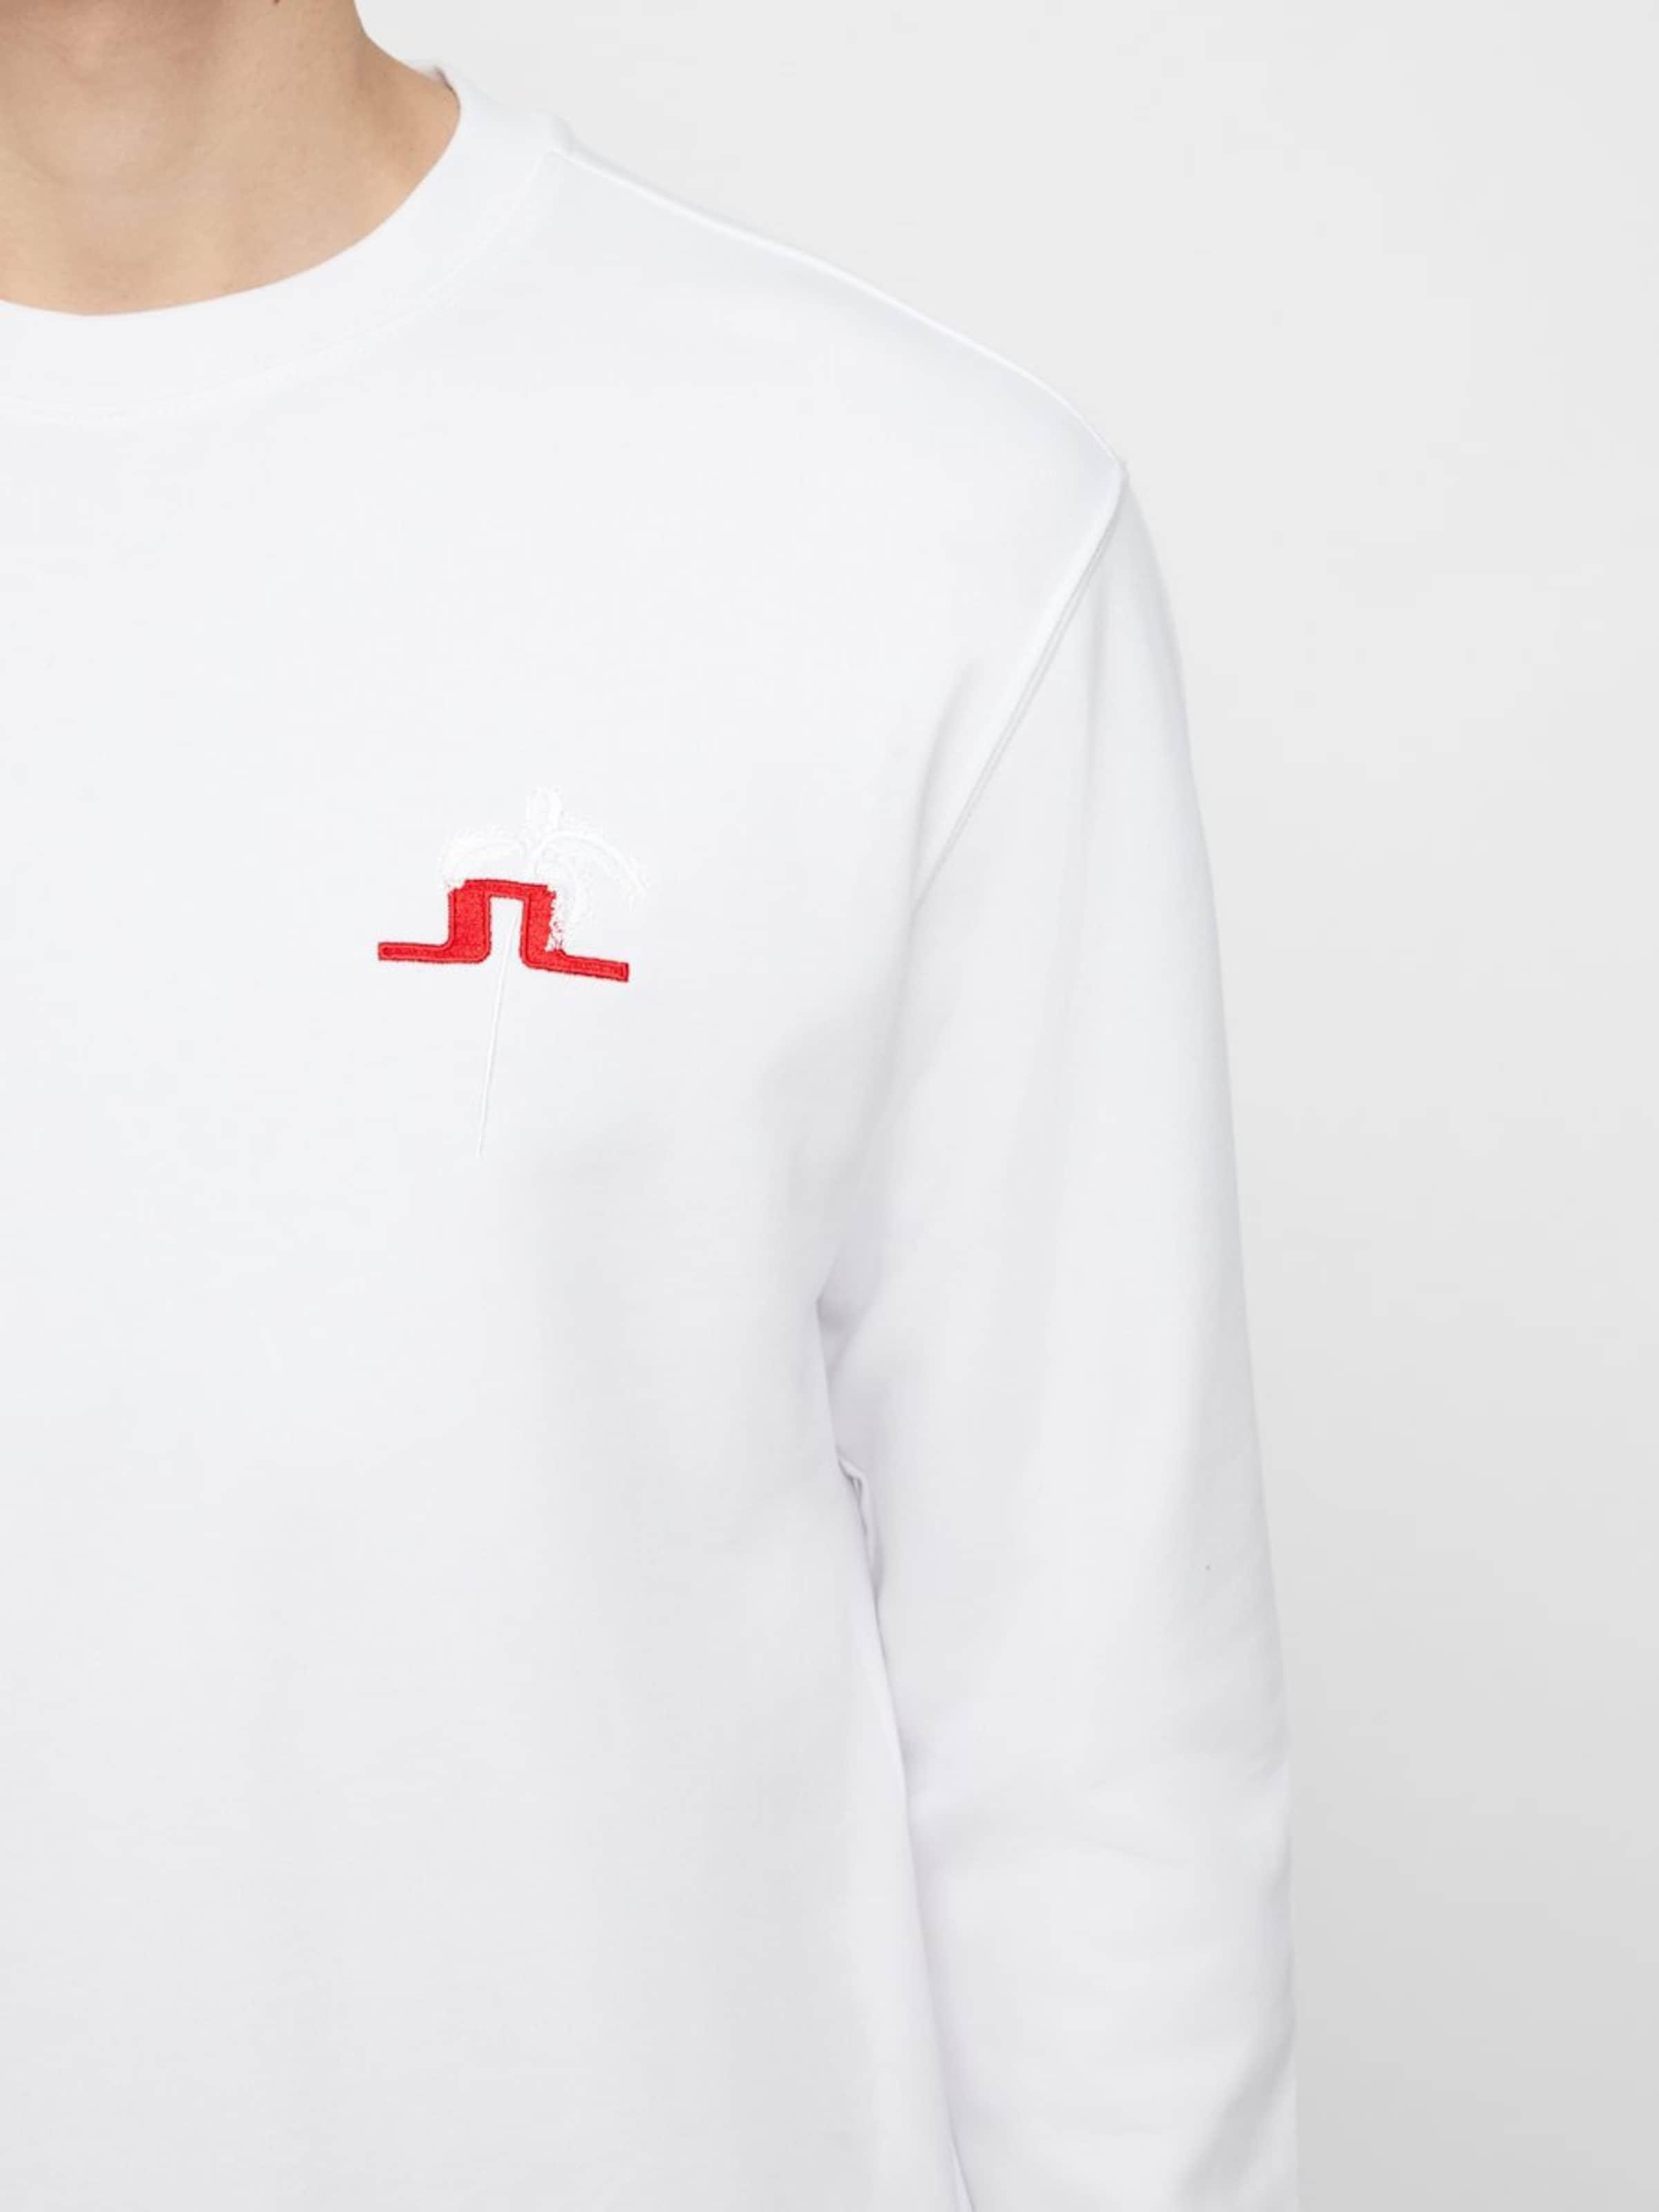 In J lindeberg Sweatshirt Weiß 'hurl' PuOkXZi